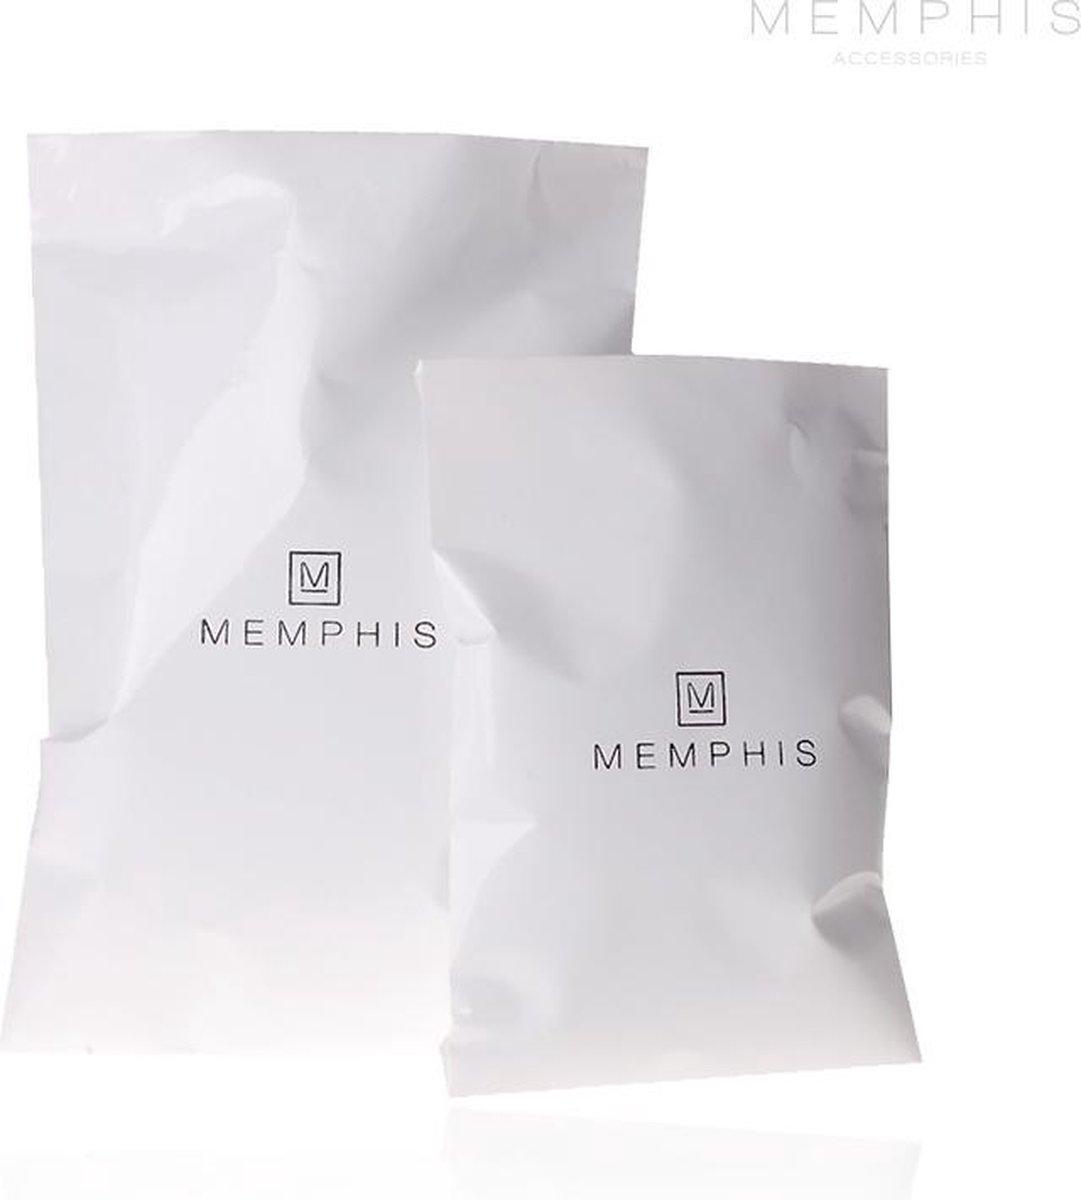 Memphis Kralen armband Lavastone Royalty Grey - Memphis